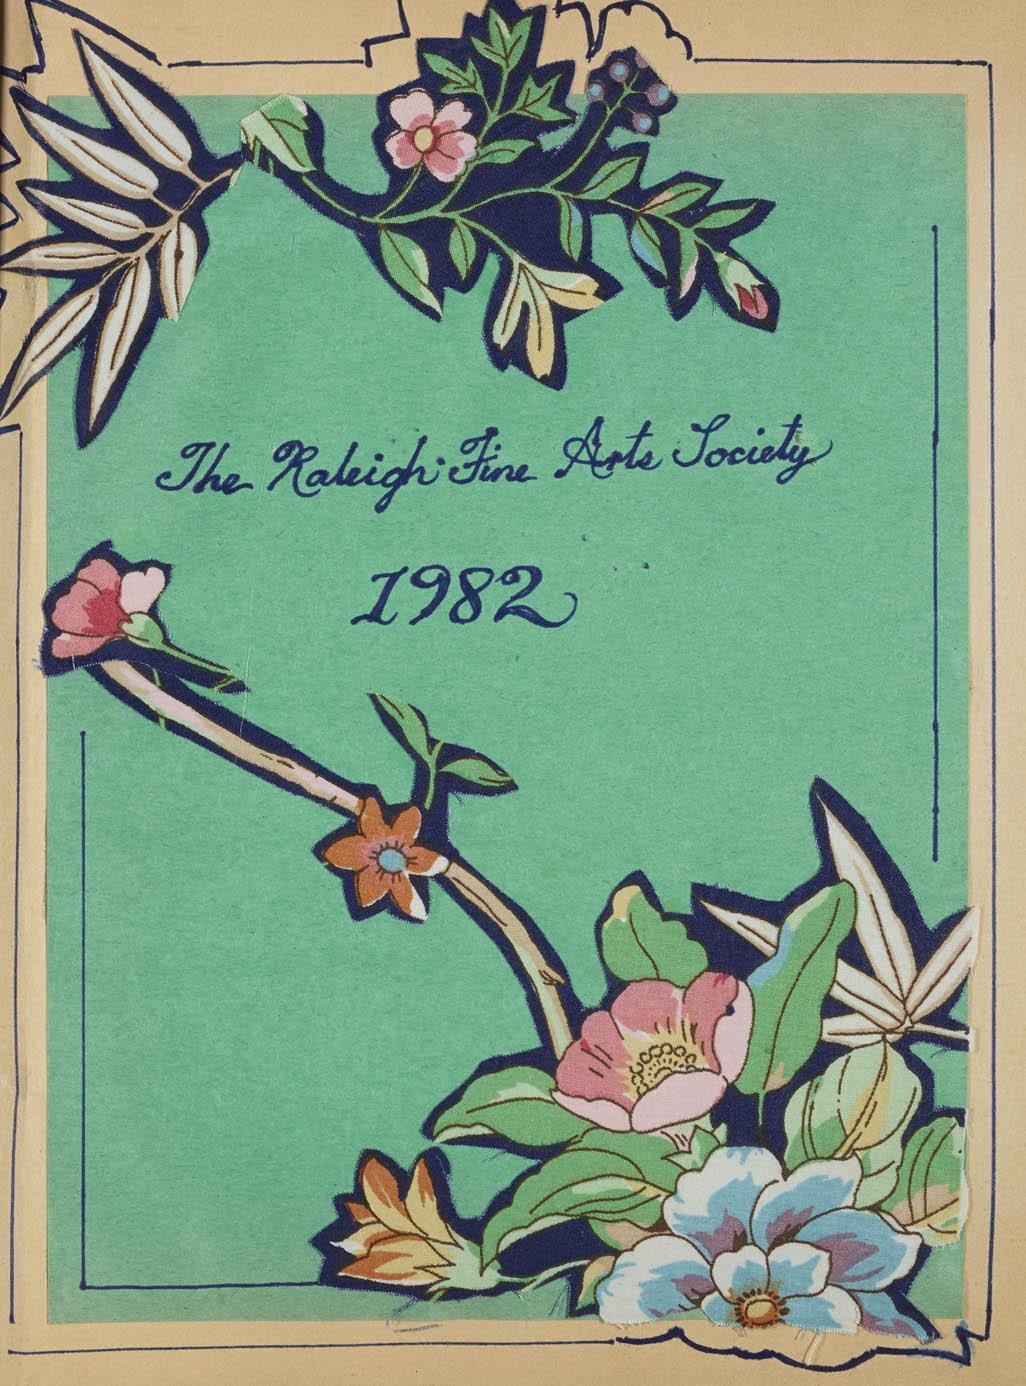 Raleigh Fine Arts Society Scrapbook, 1982